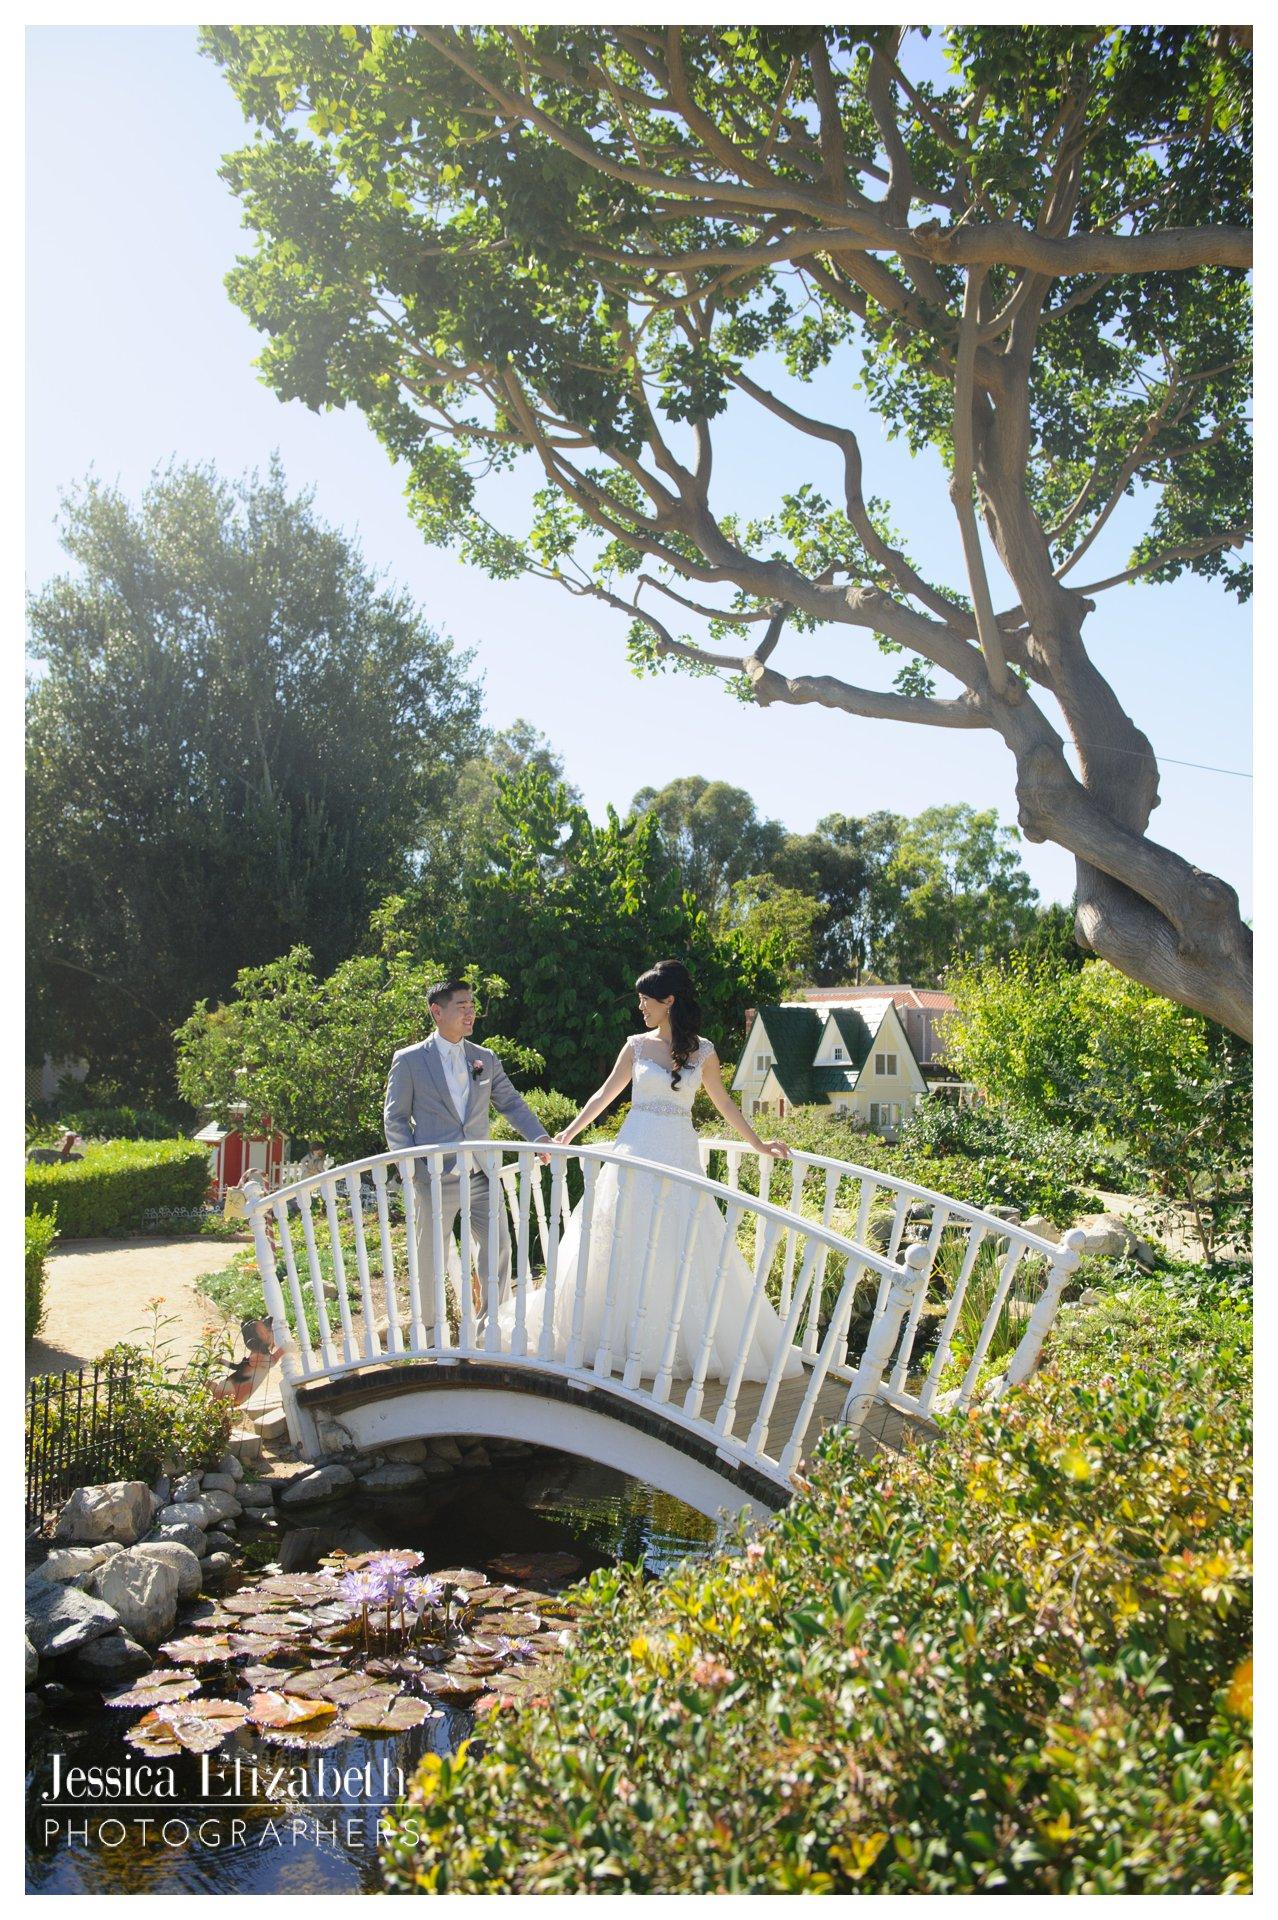 ... 14 South Coast Botanic Garden Palos Verdes Wedding Photography By  Jessica Elizabeth ...